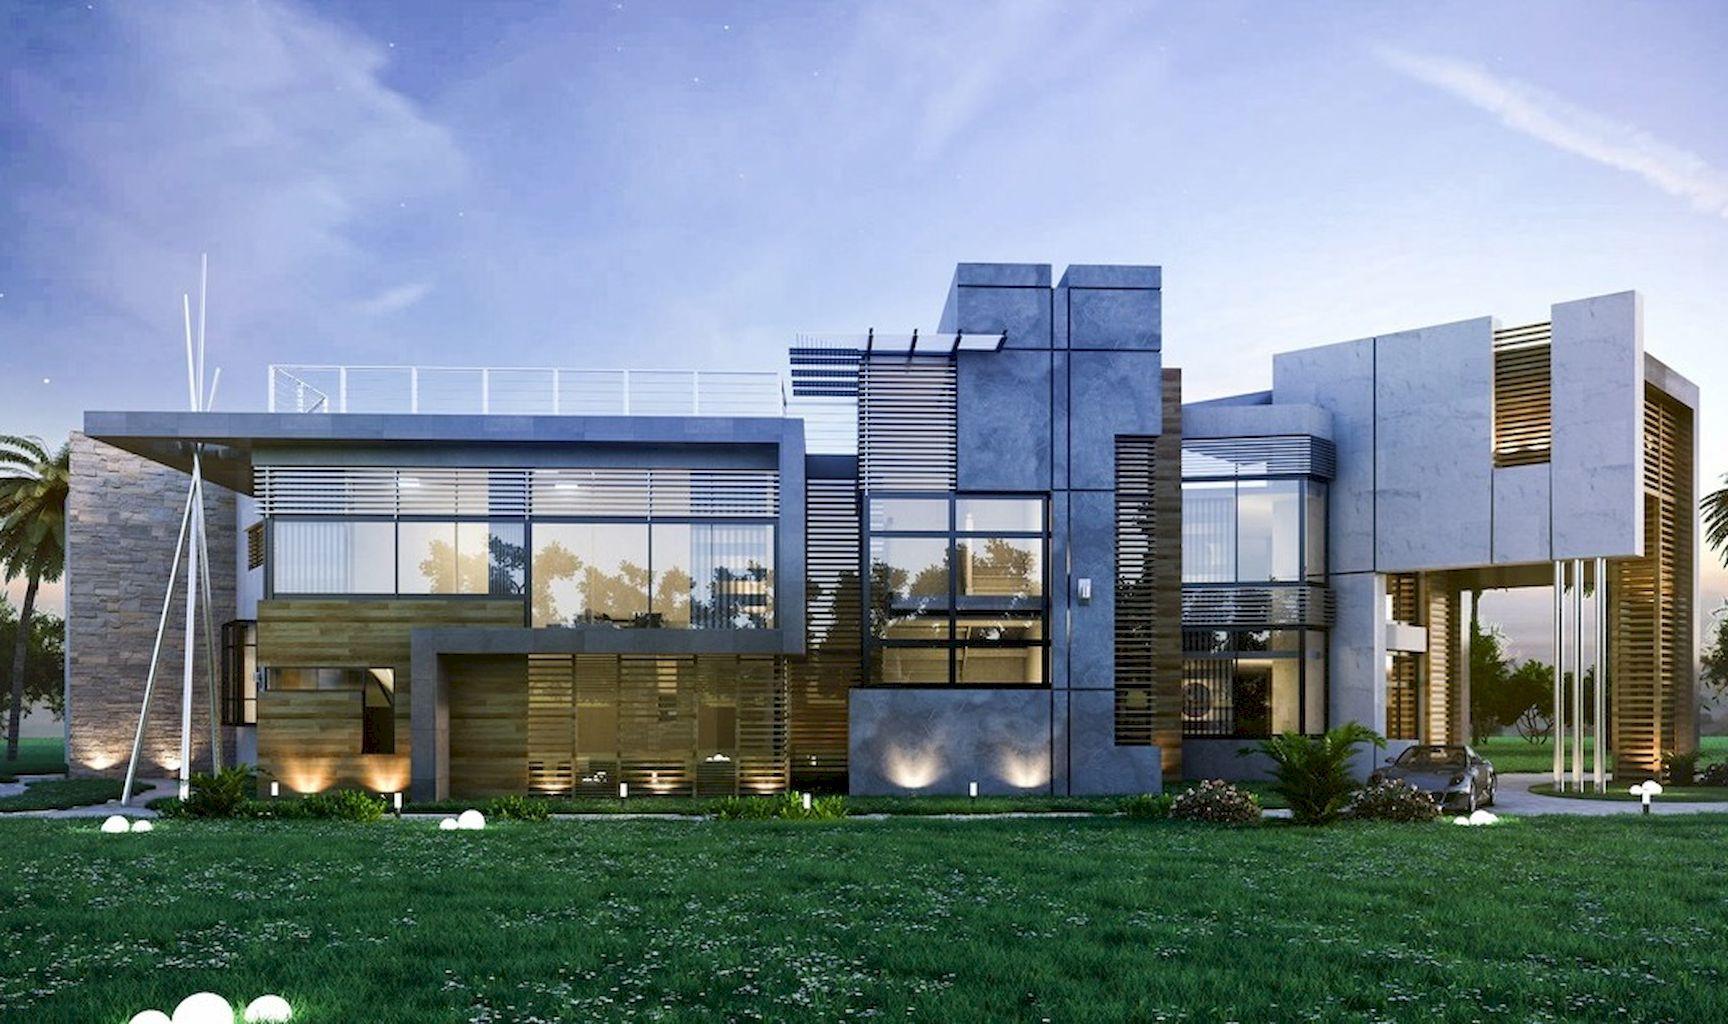 Gorgeous 30 Genius Suggestion Modern Home Exterior Ideas Source Https Buildecor Co 01 30 Genius Sugg House Designs Exterior House Exterior Exterior Design